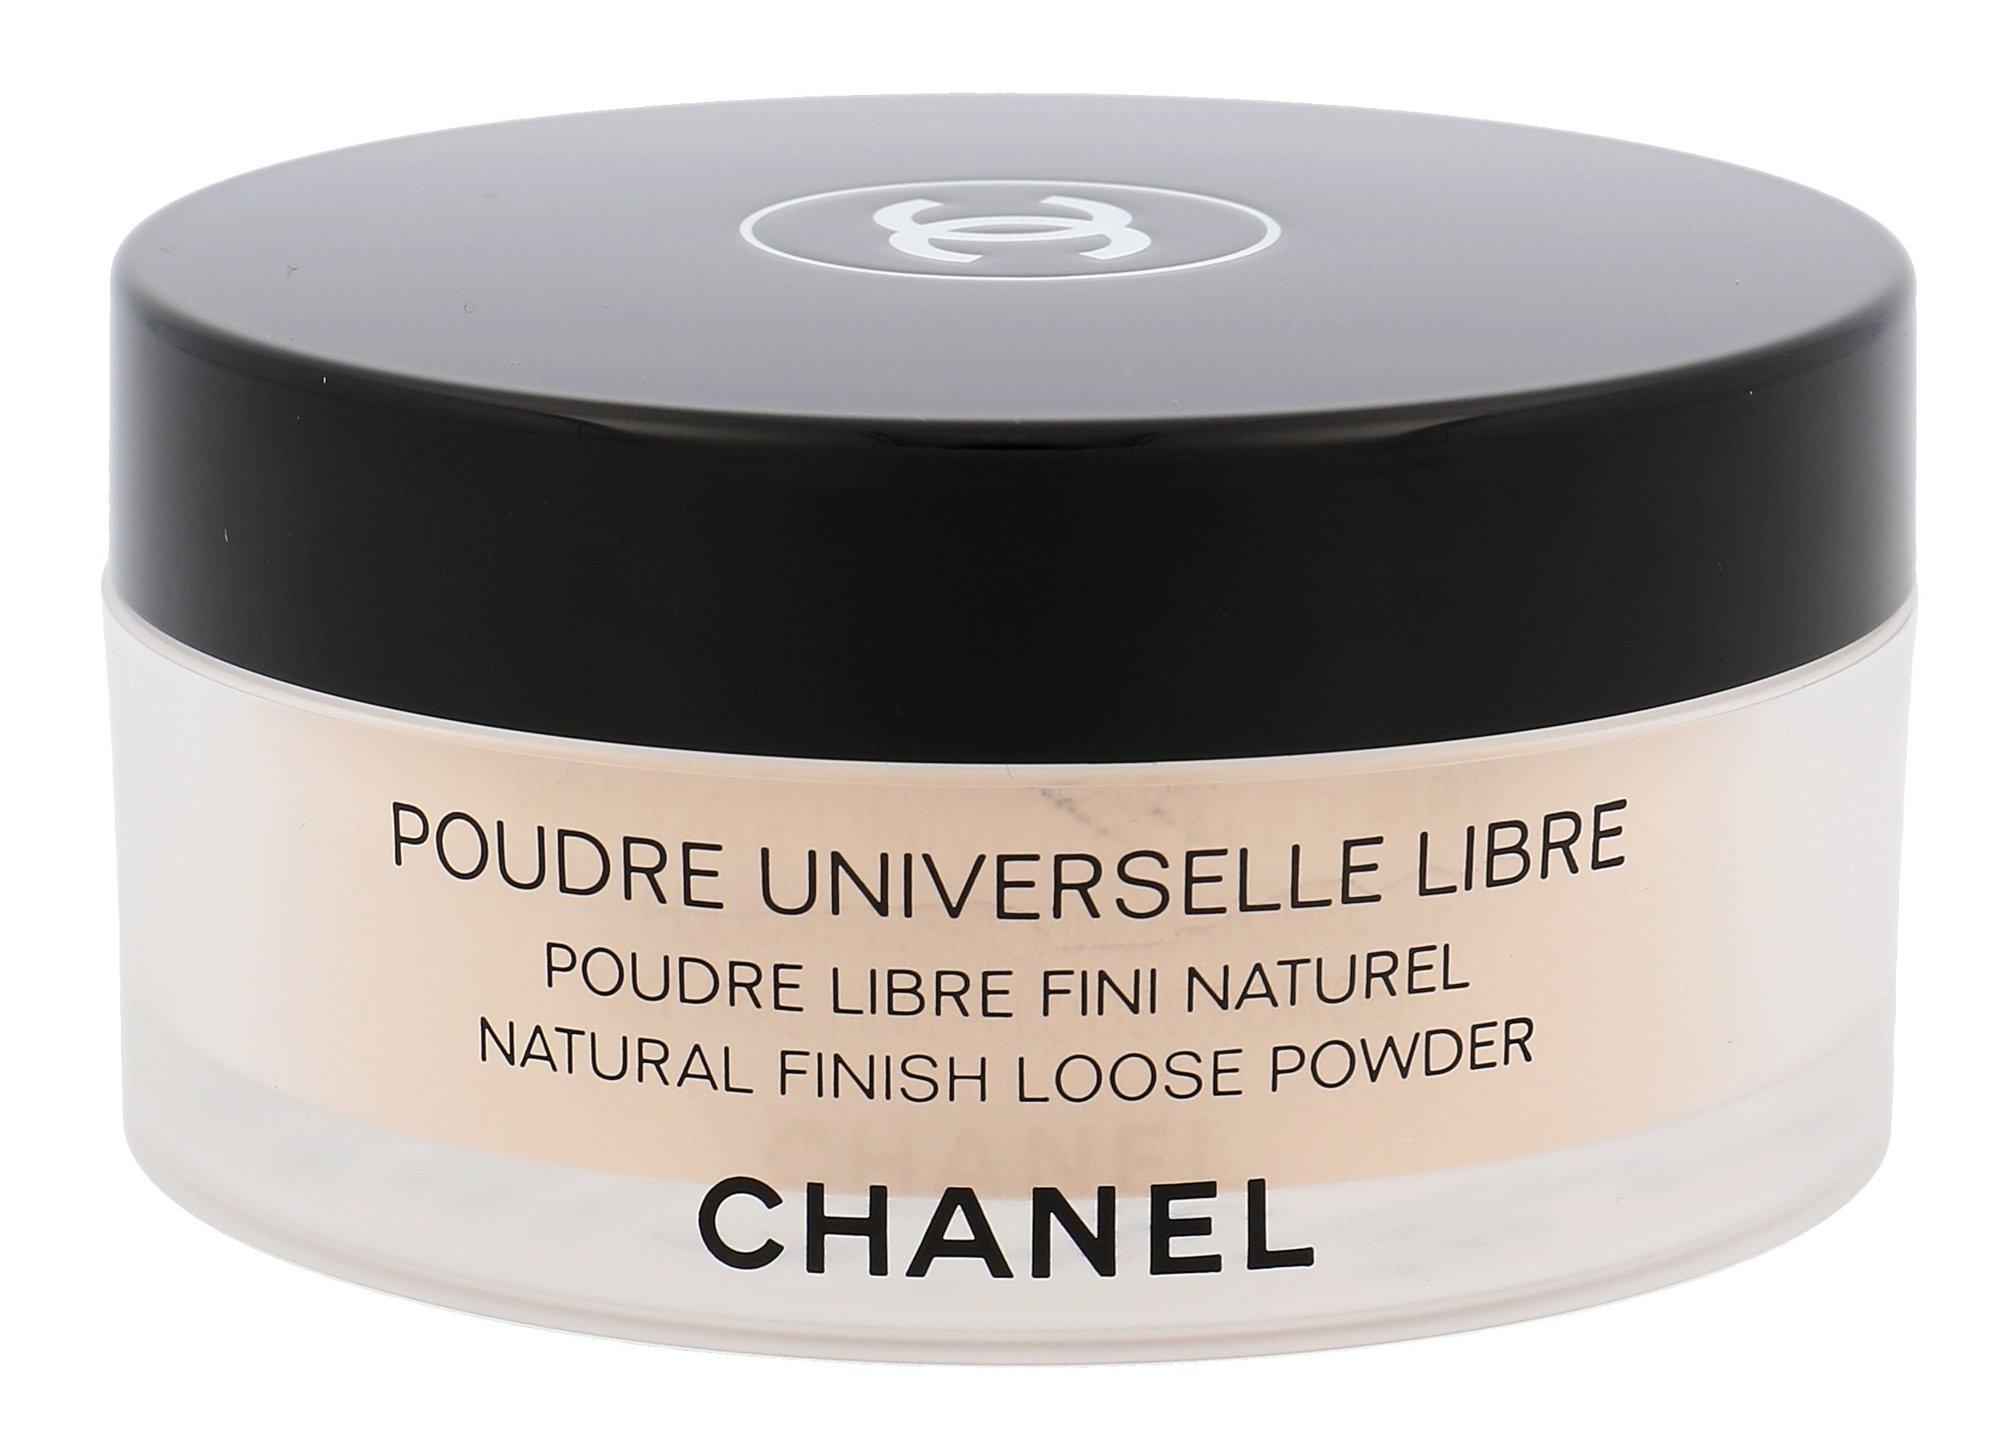 Chanel Poudre Universelle Libre Cosmetic 30ml 30 Naturel Translucent 2